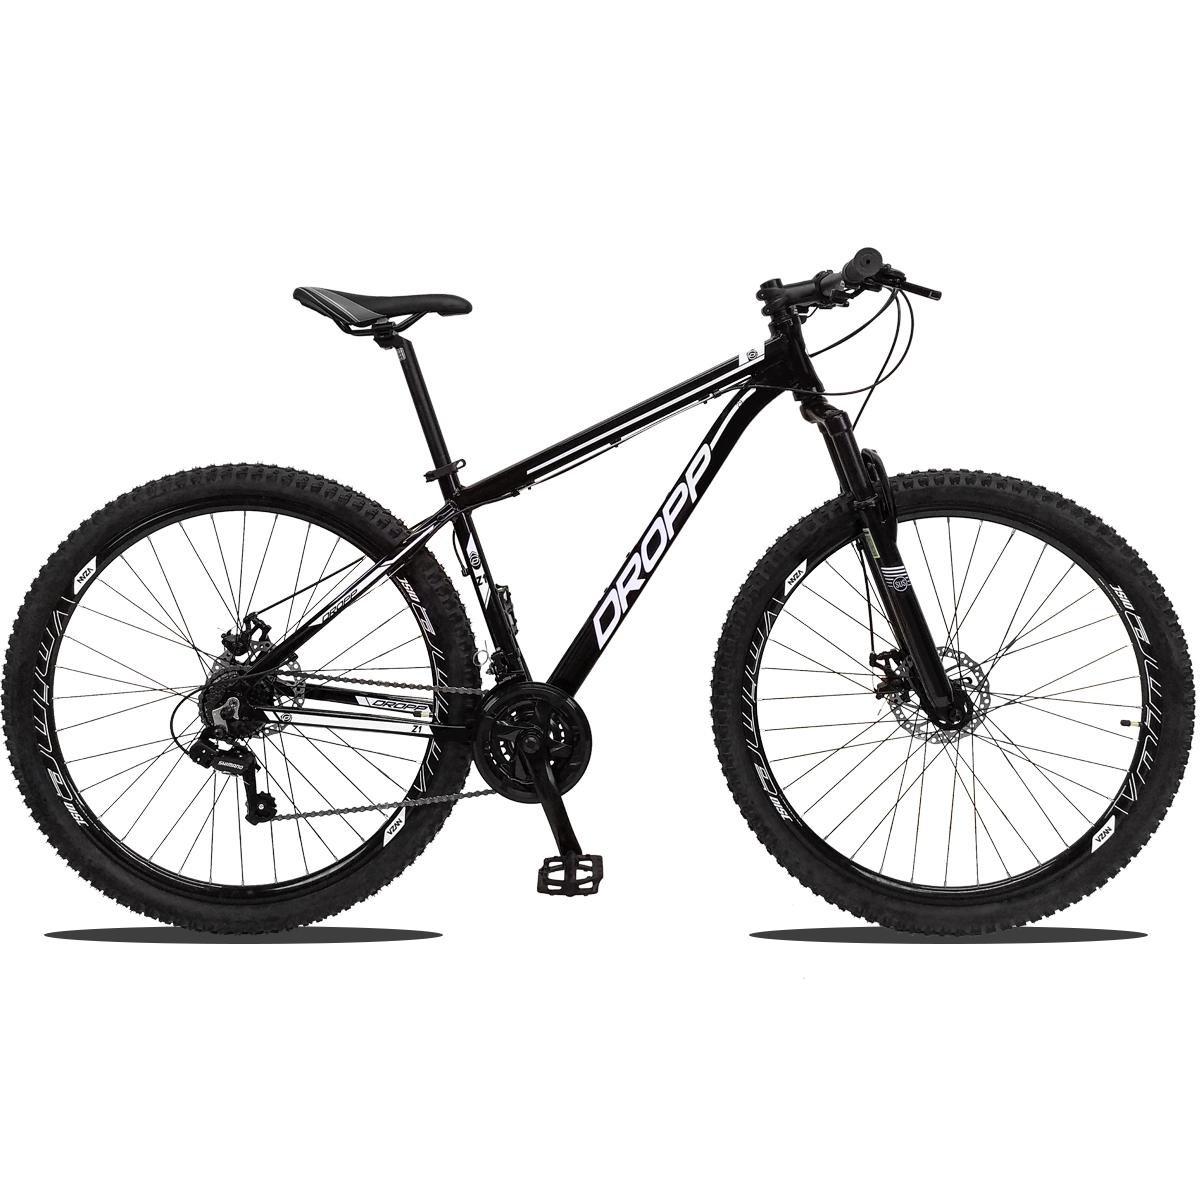 Bicicleta Dropp Z1 T17 Aro 29 Susp. Dianteira 21 Marchas - Preto